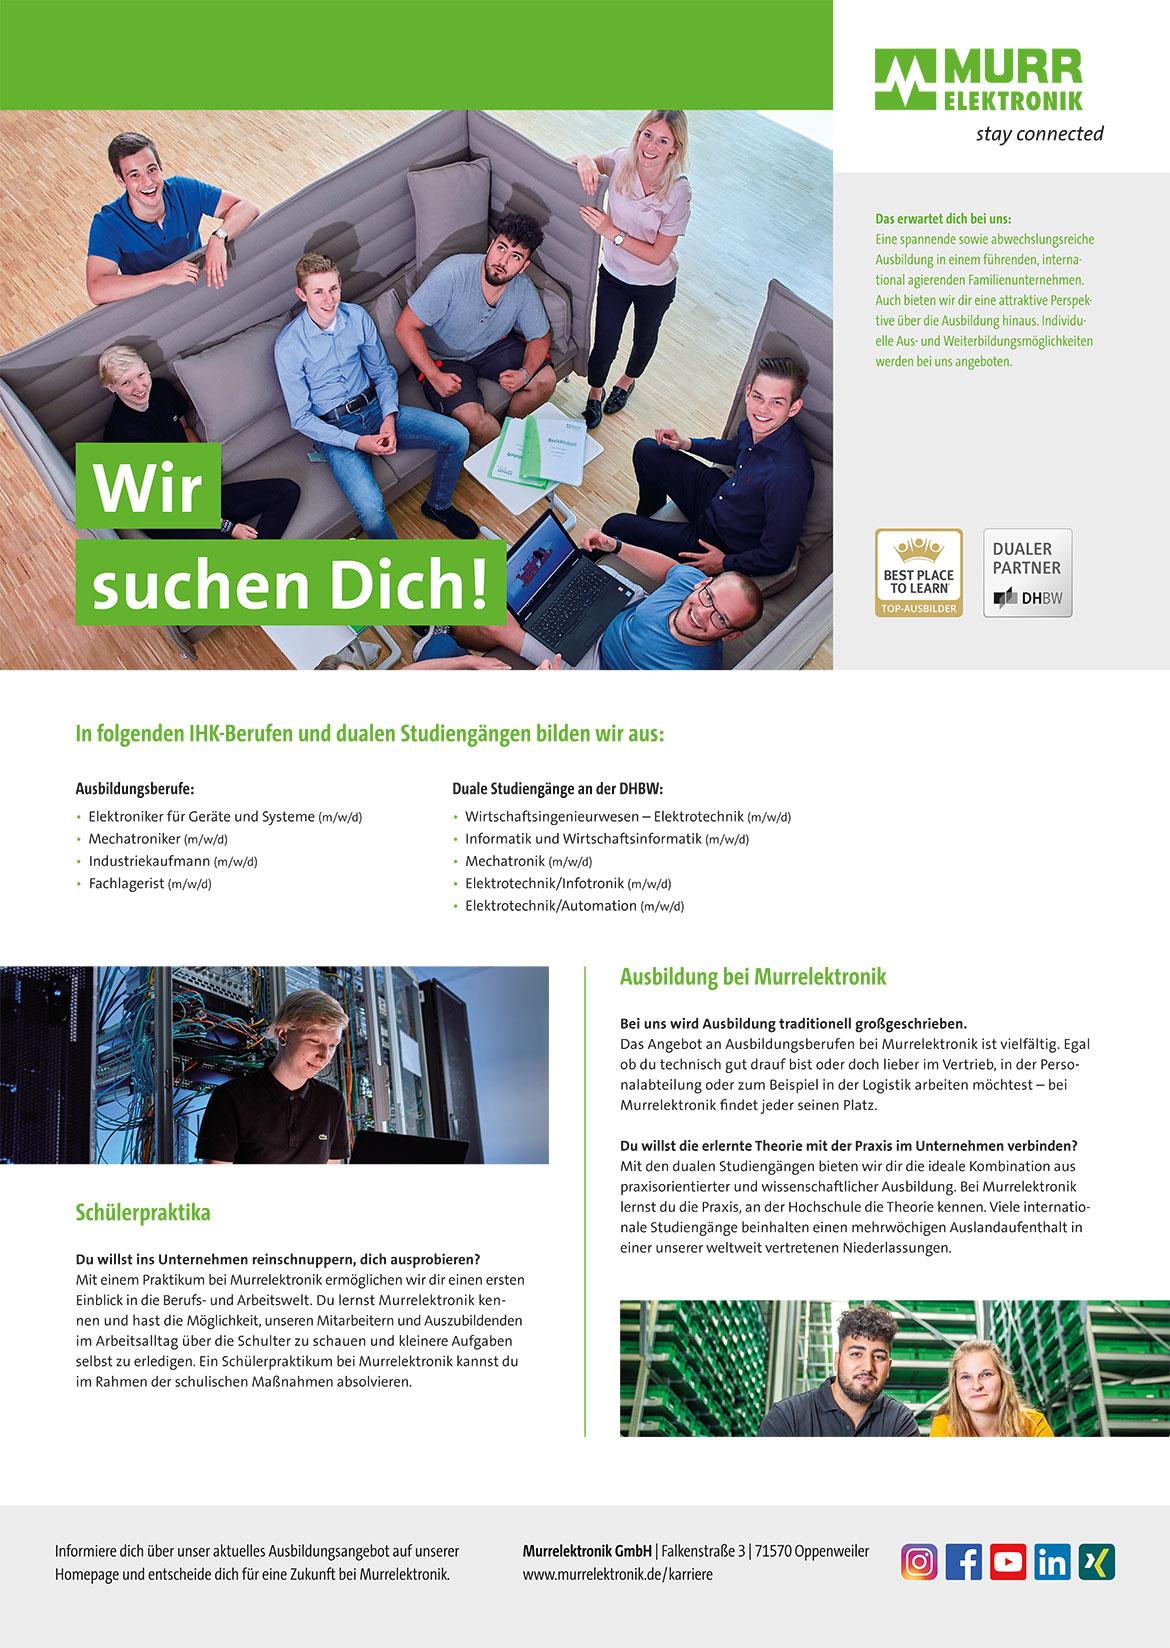 Ausbildungsplakat: Murrelektronik GmbH